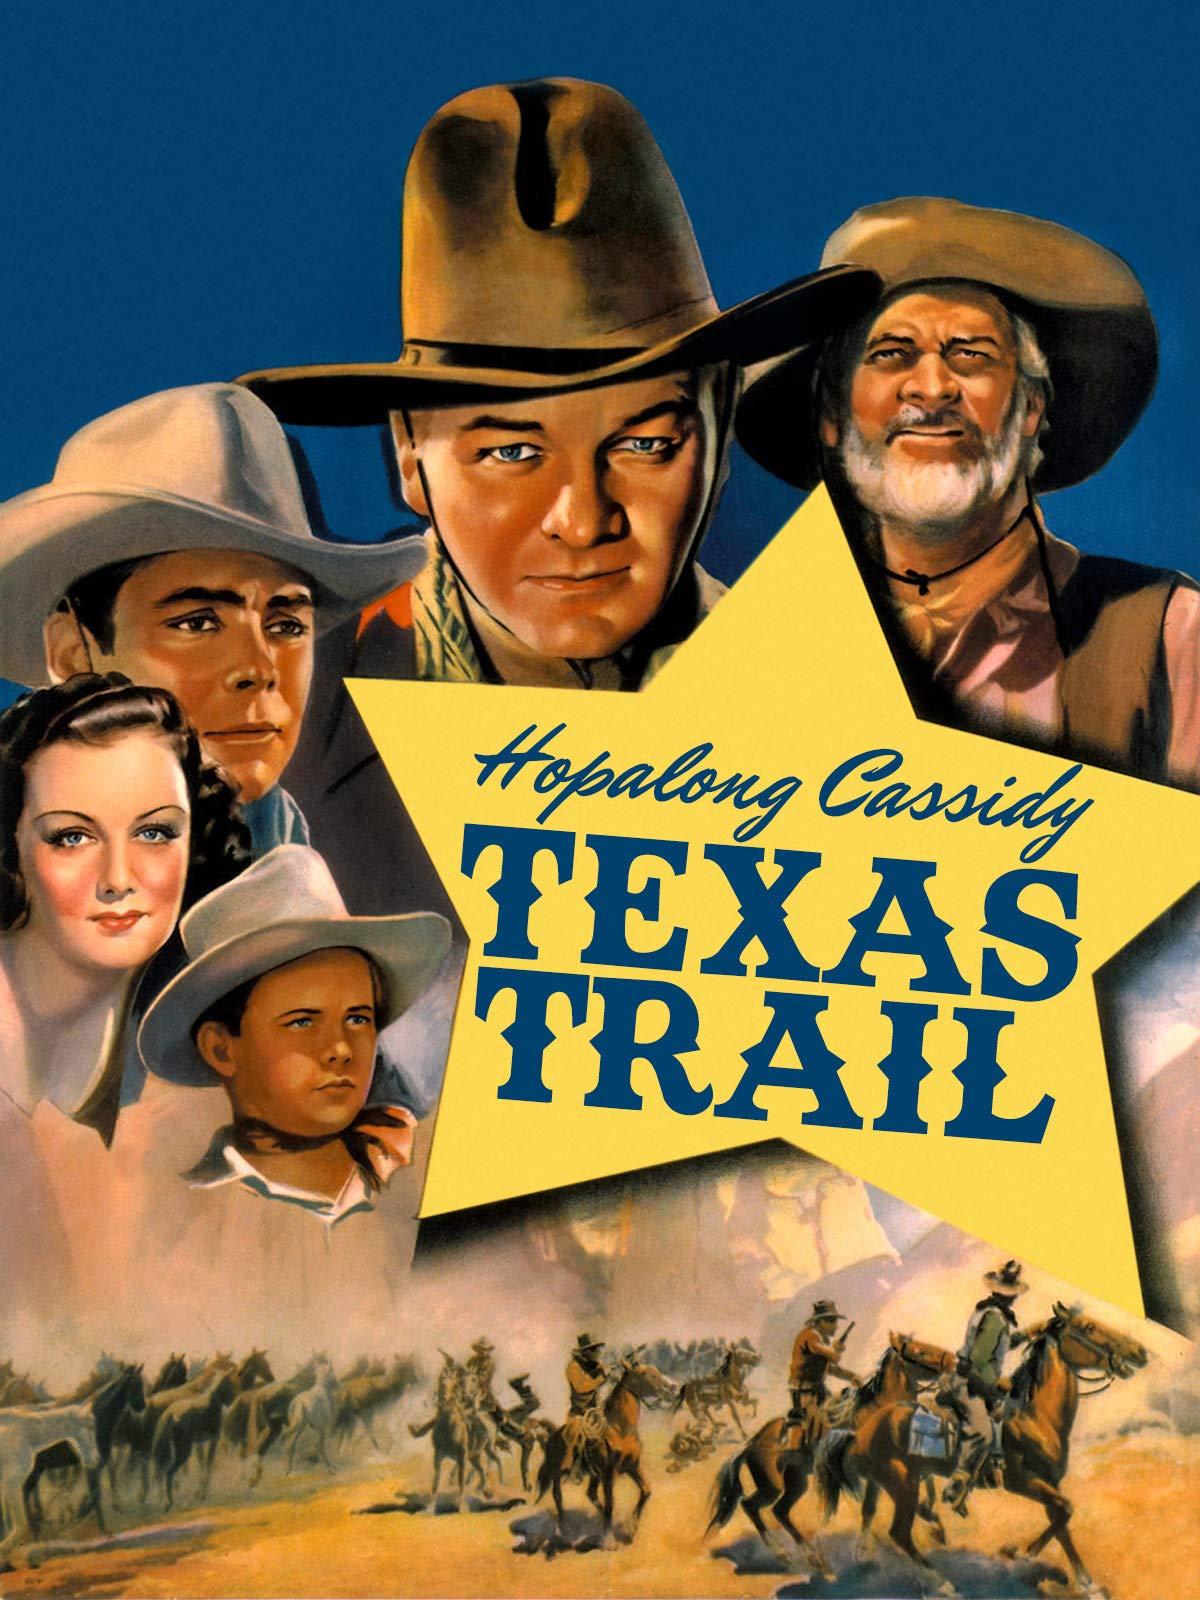 Hopalong Cassidy Texas Trail